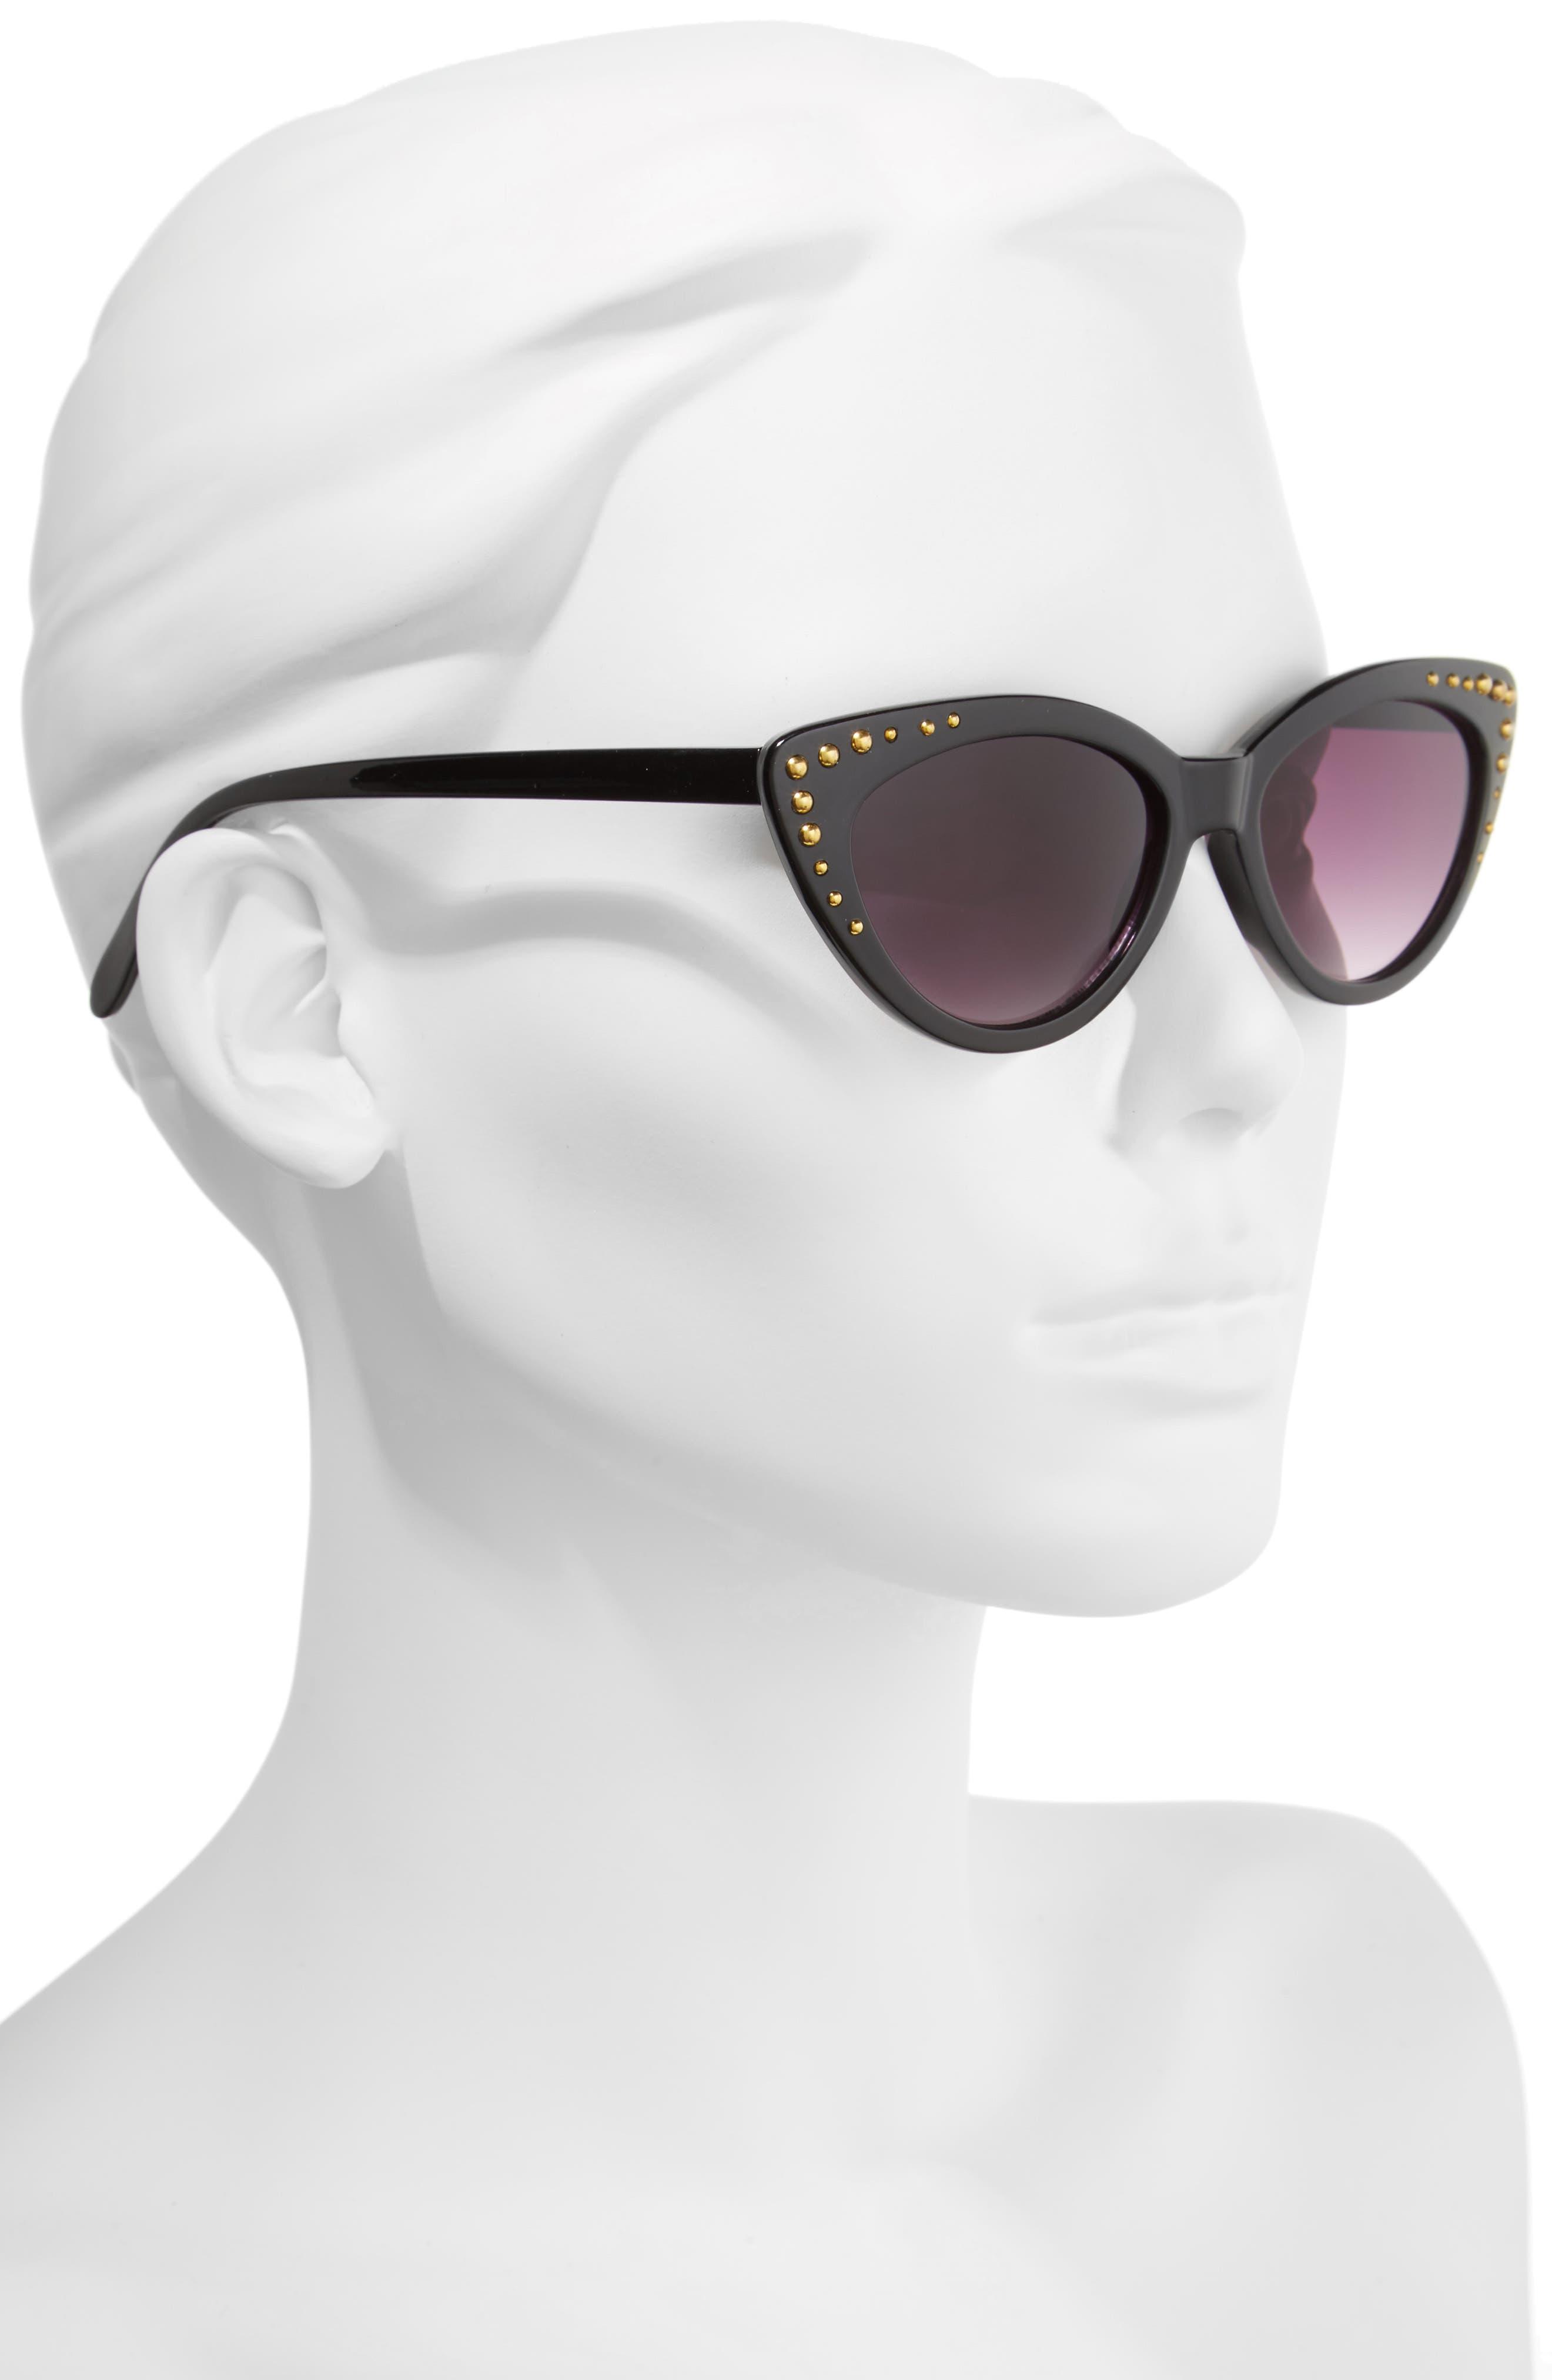 52mm Stud Detail Cat Eye Sunglasses,                             Alternate thumbnail 2, color,                             Black/ Gold